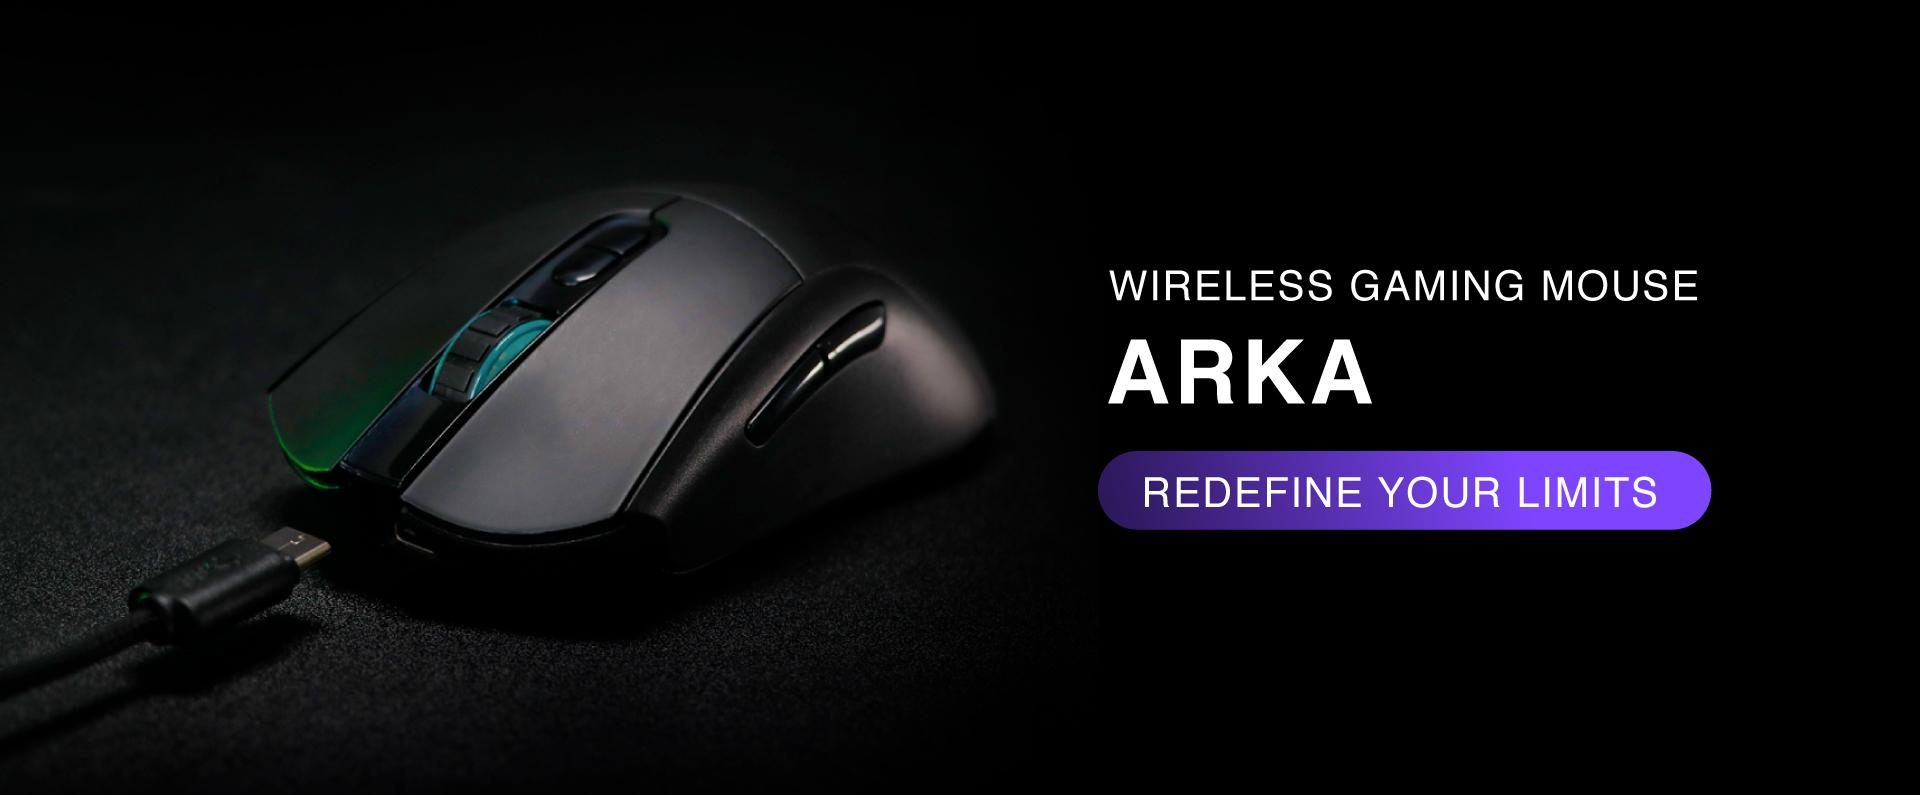 mouse gaming Rexus ARKA WL ARK 01